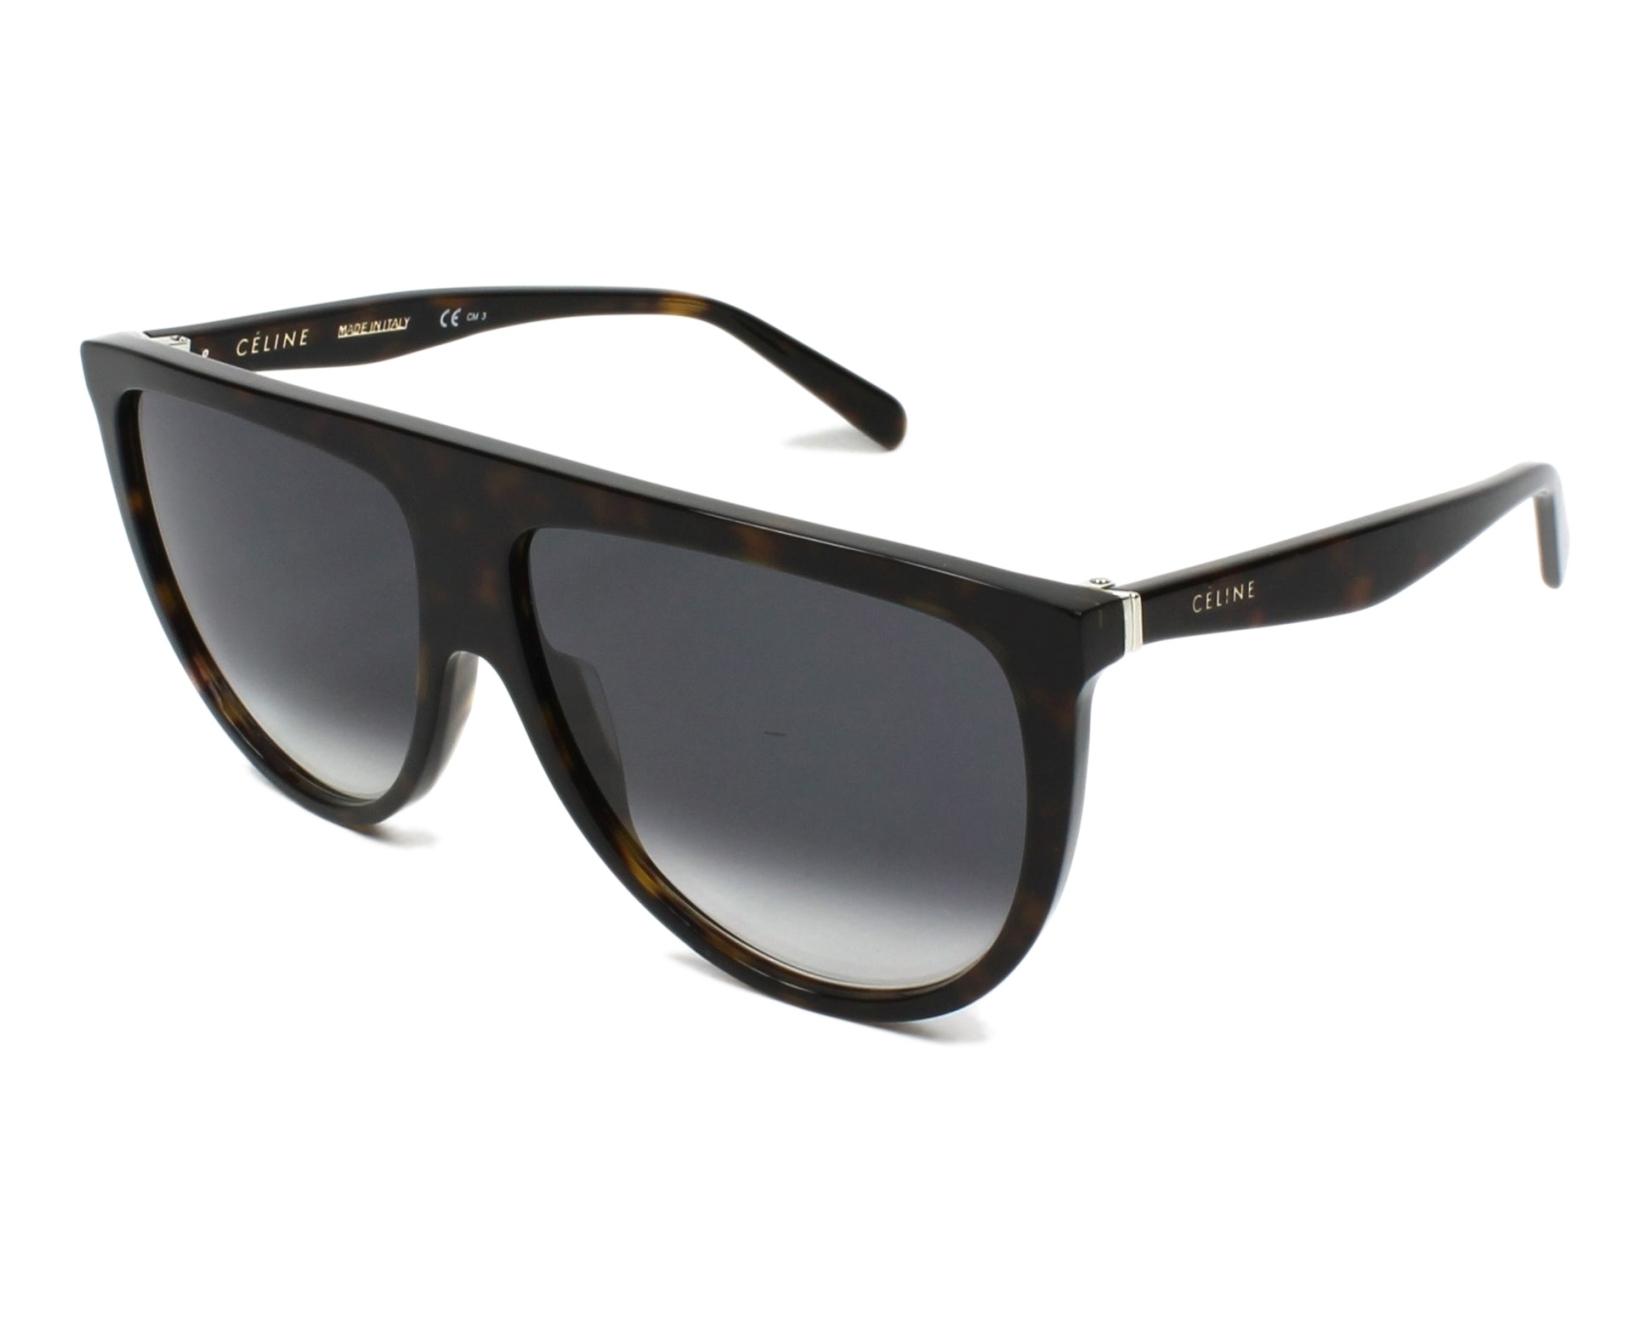 b12b541f28f2 thumbnail Sunglasses Céline CL-41435-S O86 W2 - Havana profile view